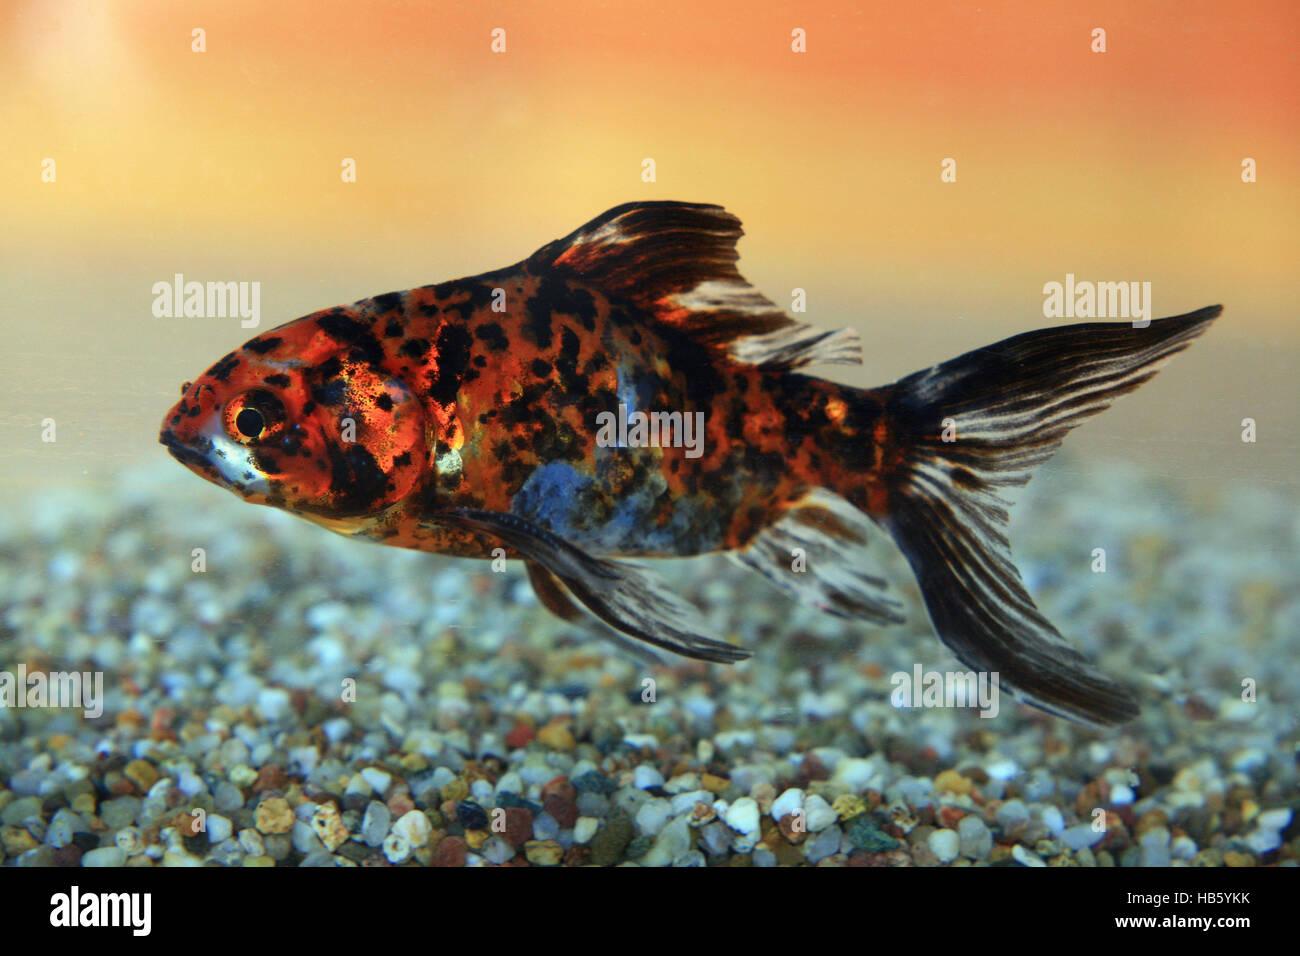 Shubunkin goldfish stock photo 127365271 alamy for Shubunkin im gartenteich